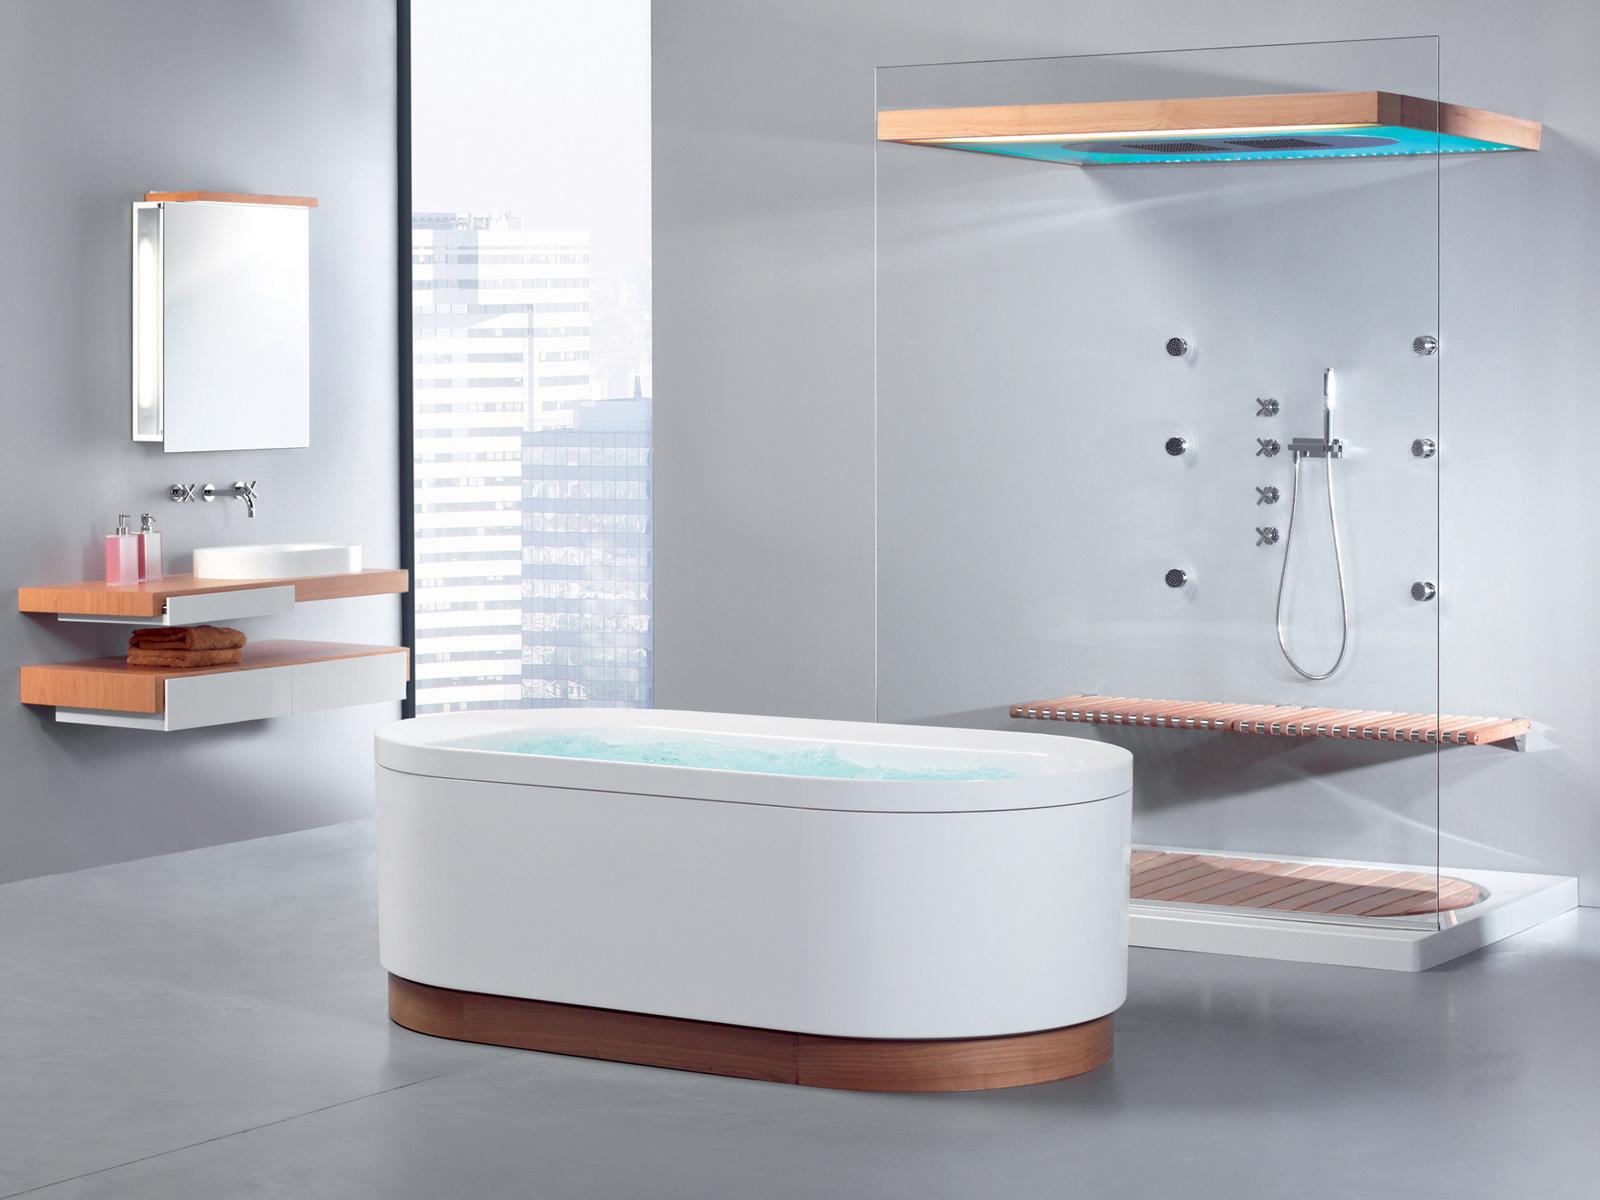 new bathrooms ideas photo - 1